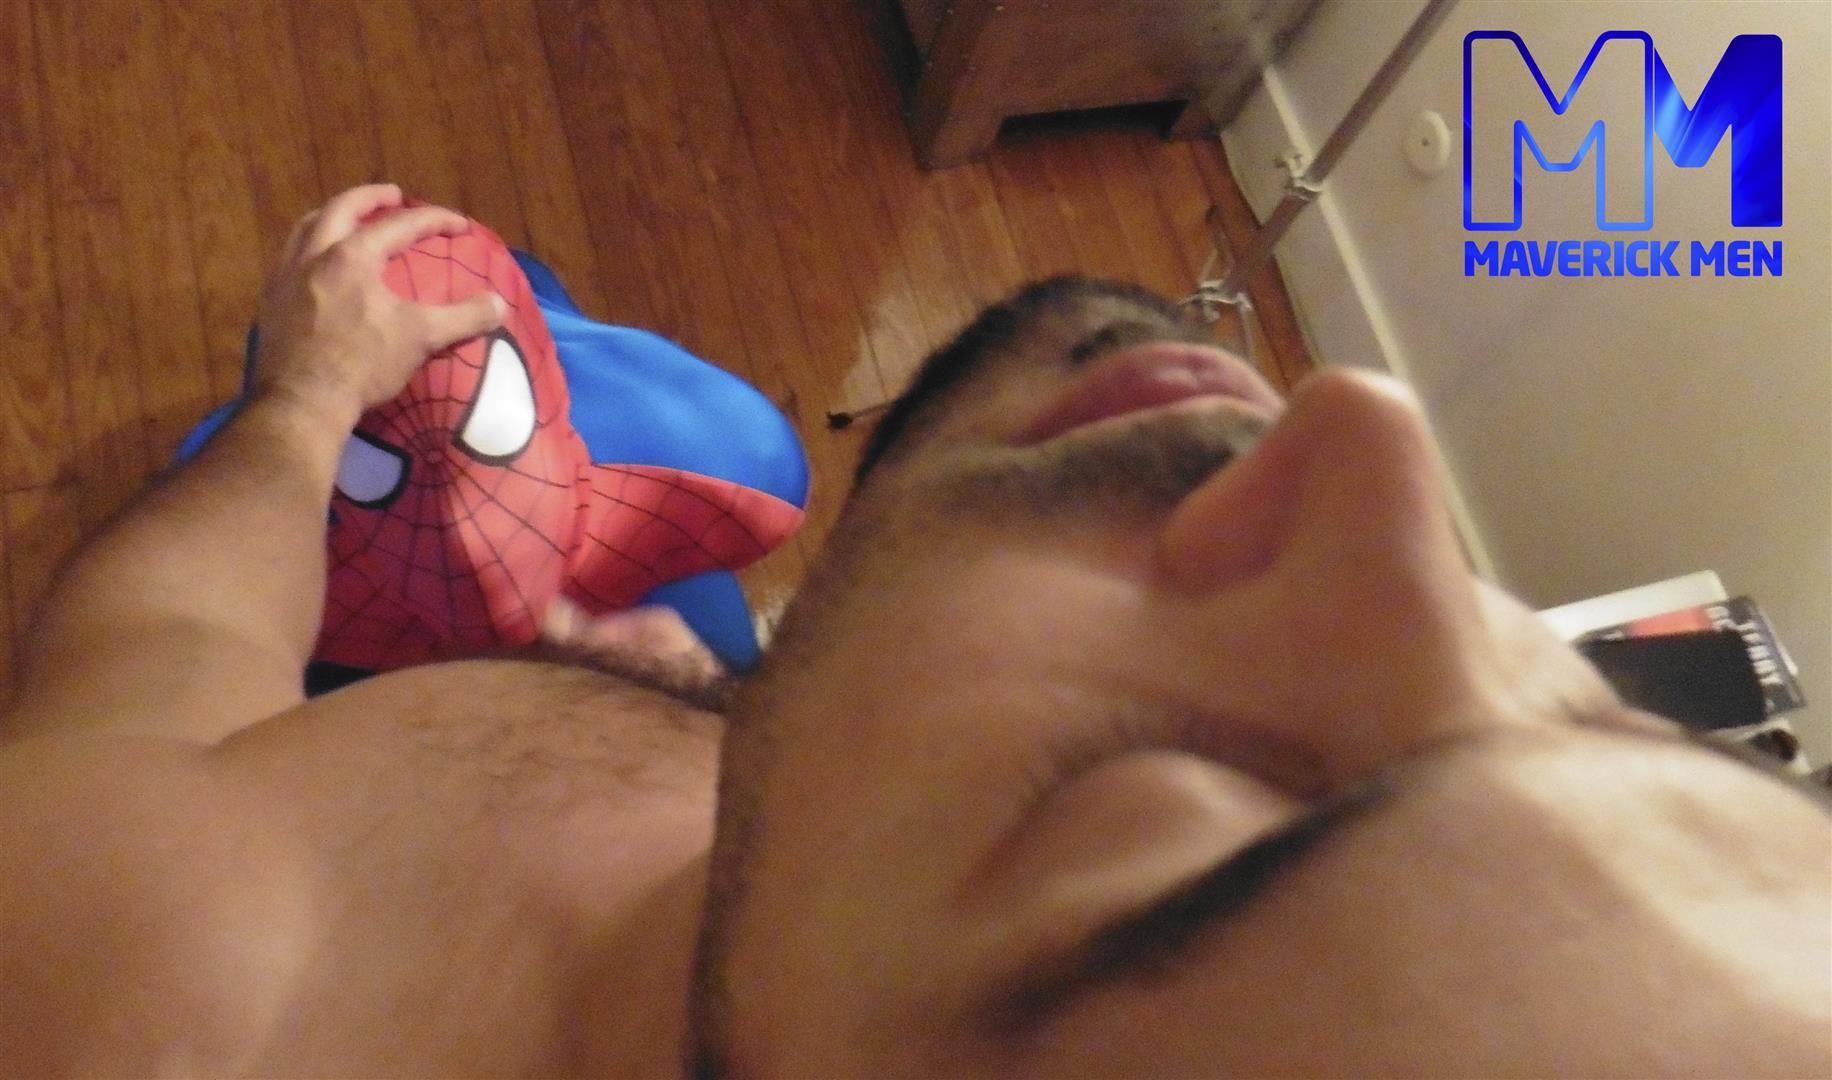 Maverick Men Spiderman With A Big Black Dick Bareback Threesome Amateur Gay Porn 12 Happy Halloween... Did You Know That Spiderman Has A Big Black Dick?